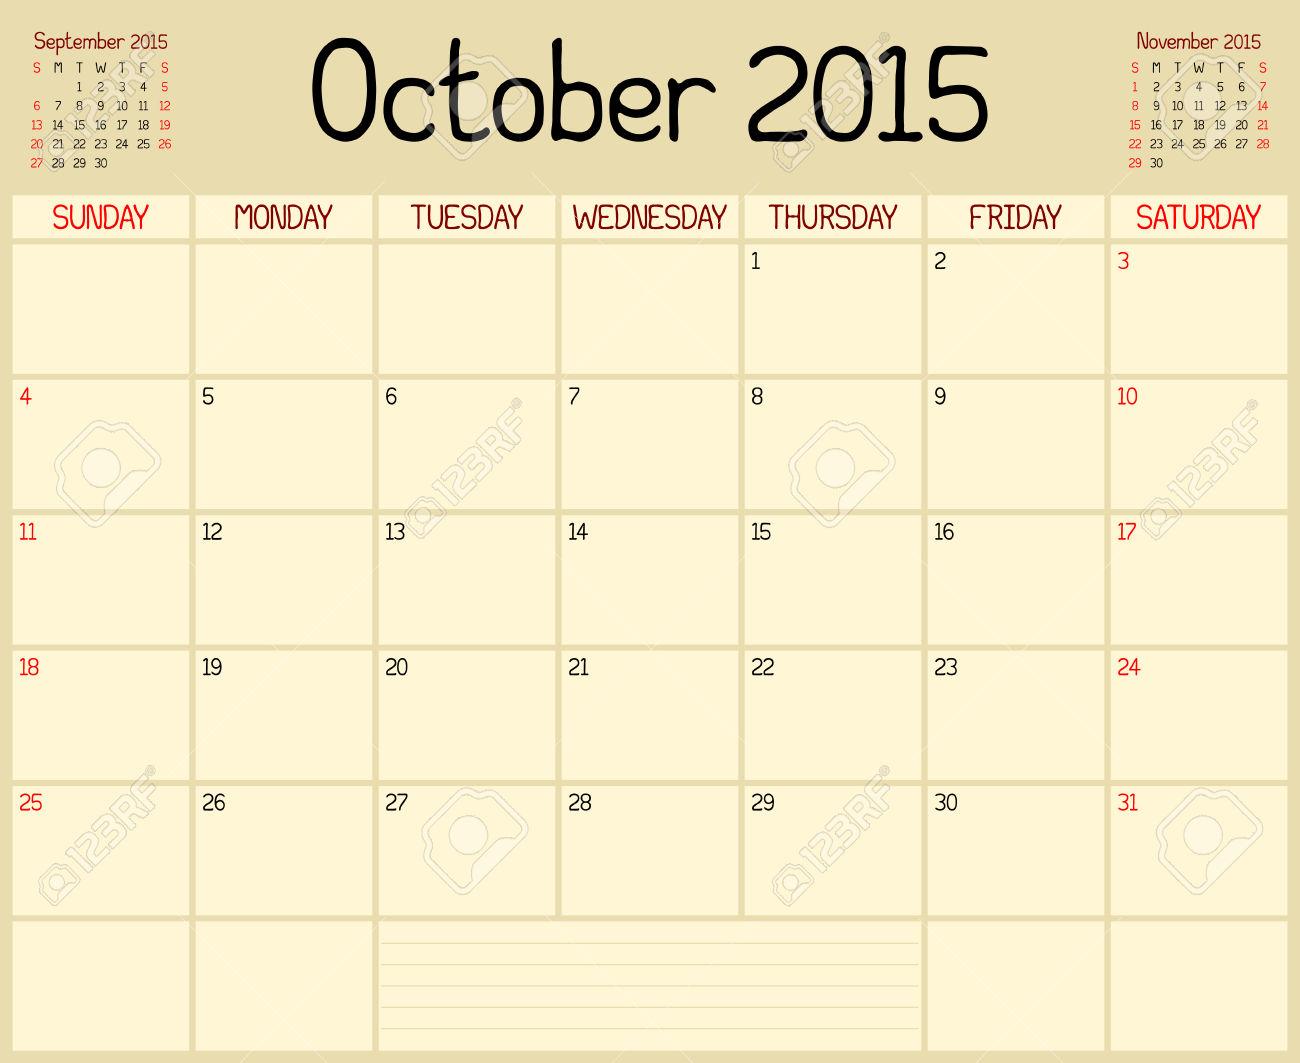 October 2015 Calendar Clip Art.